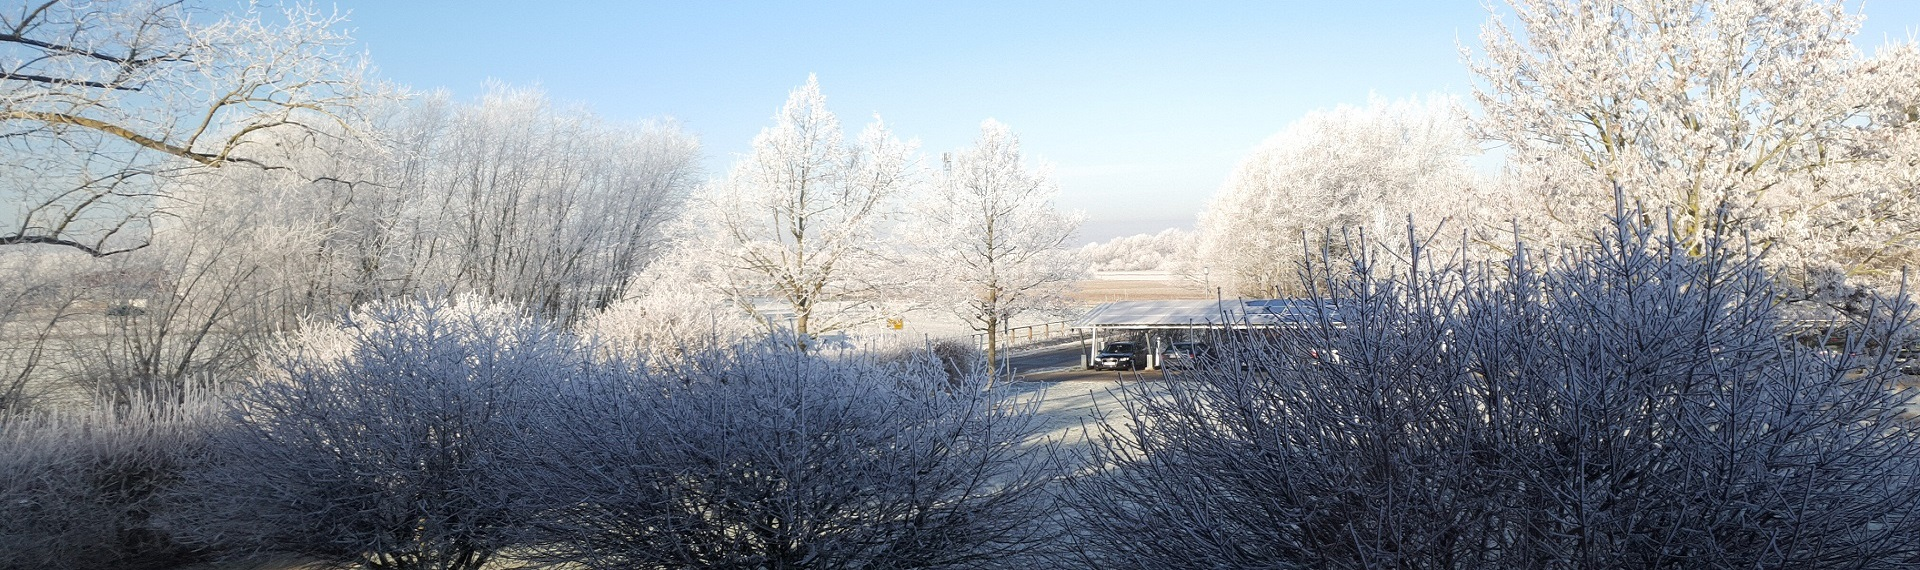 Winter - Rathaus Frost